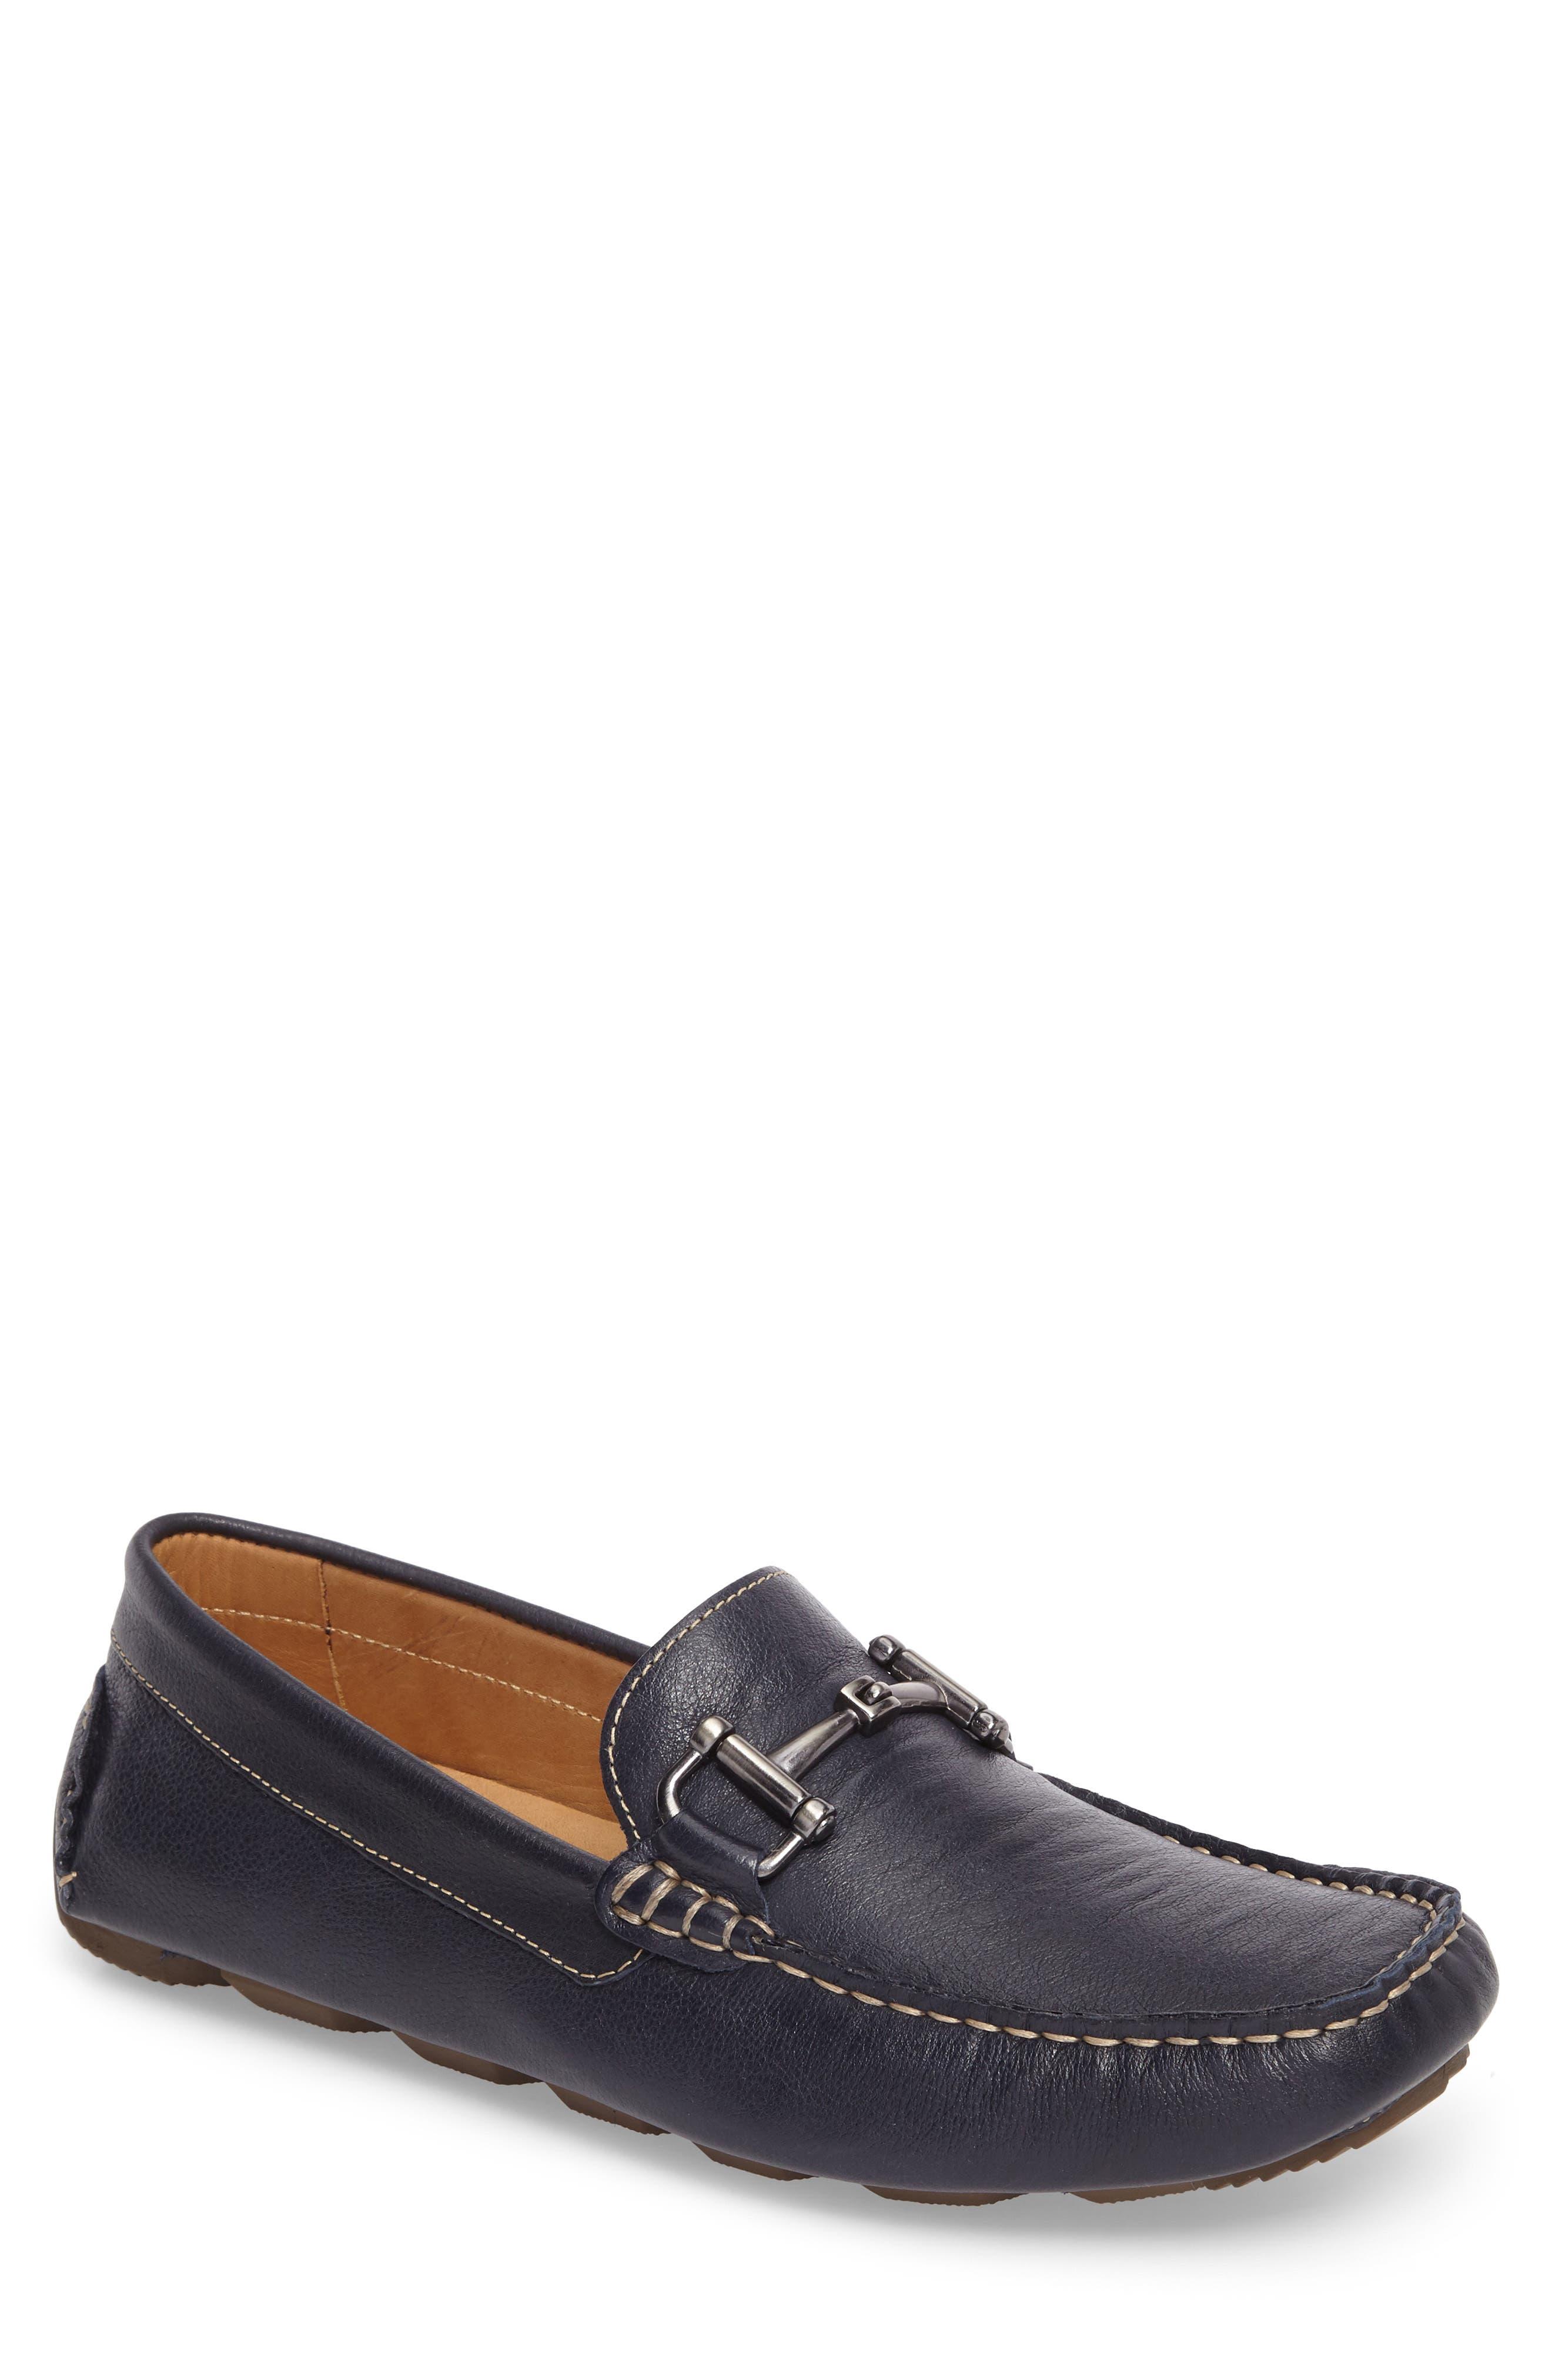 Topanga Driving Shoe,                             Main thumbnail 1, color,                             Navy Leather